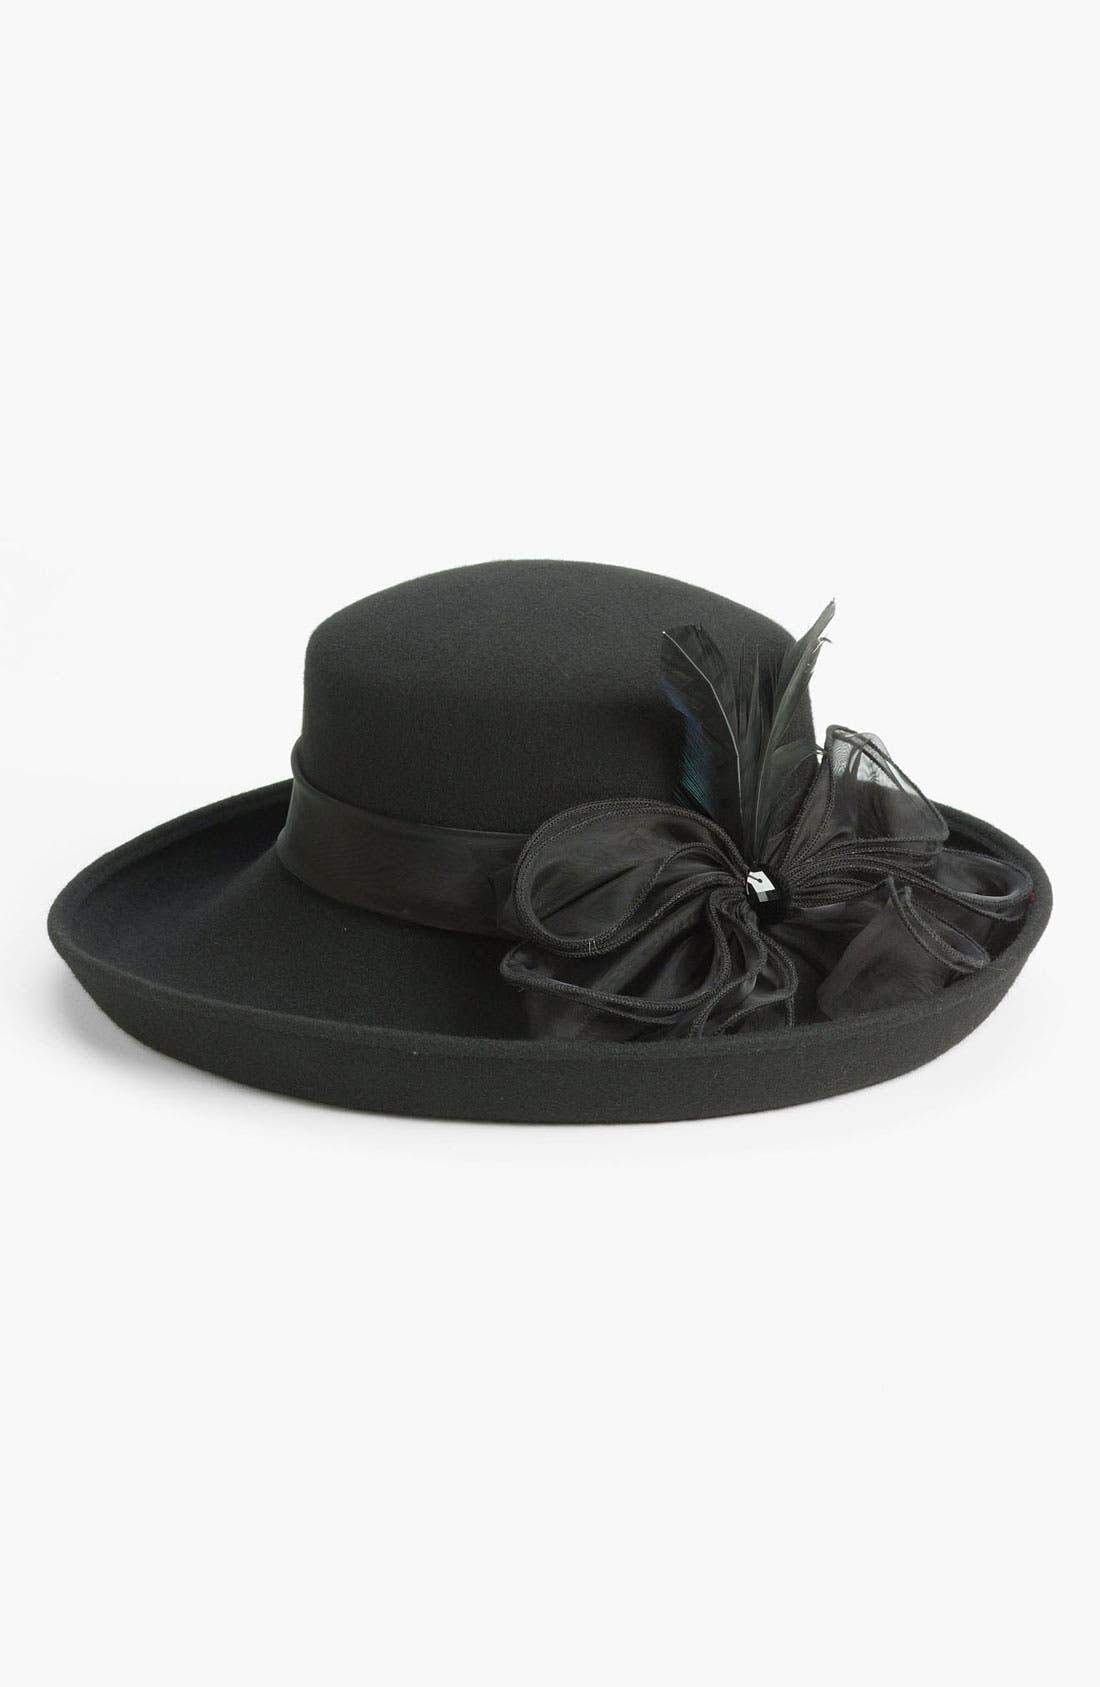 Alternate Image 1 Selected - August Hat 'Helene' Hat